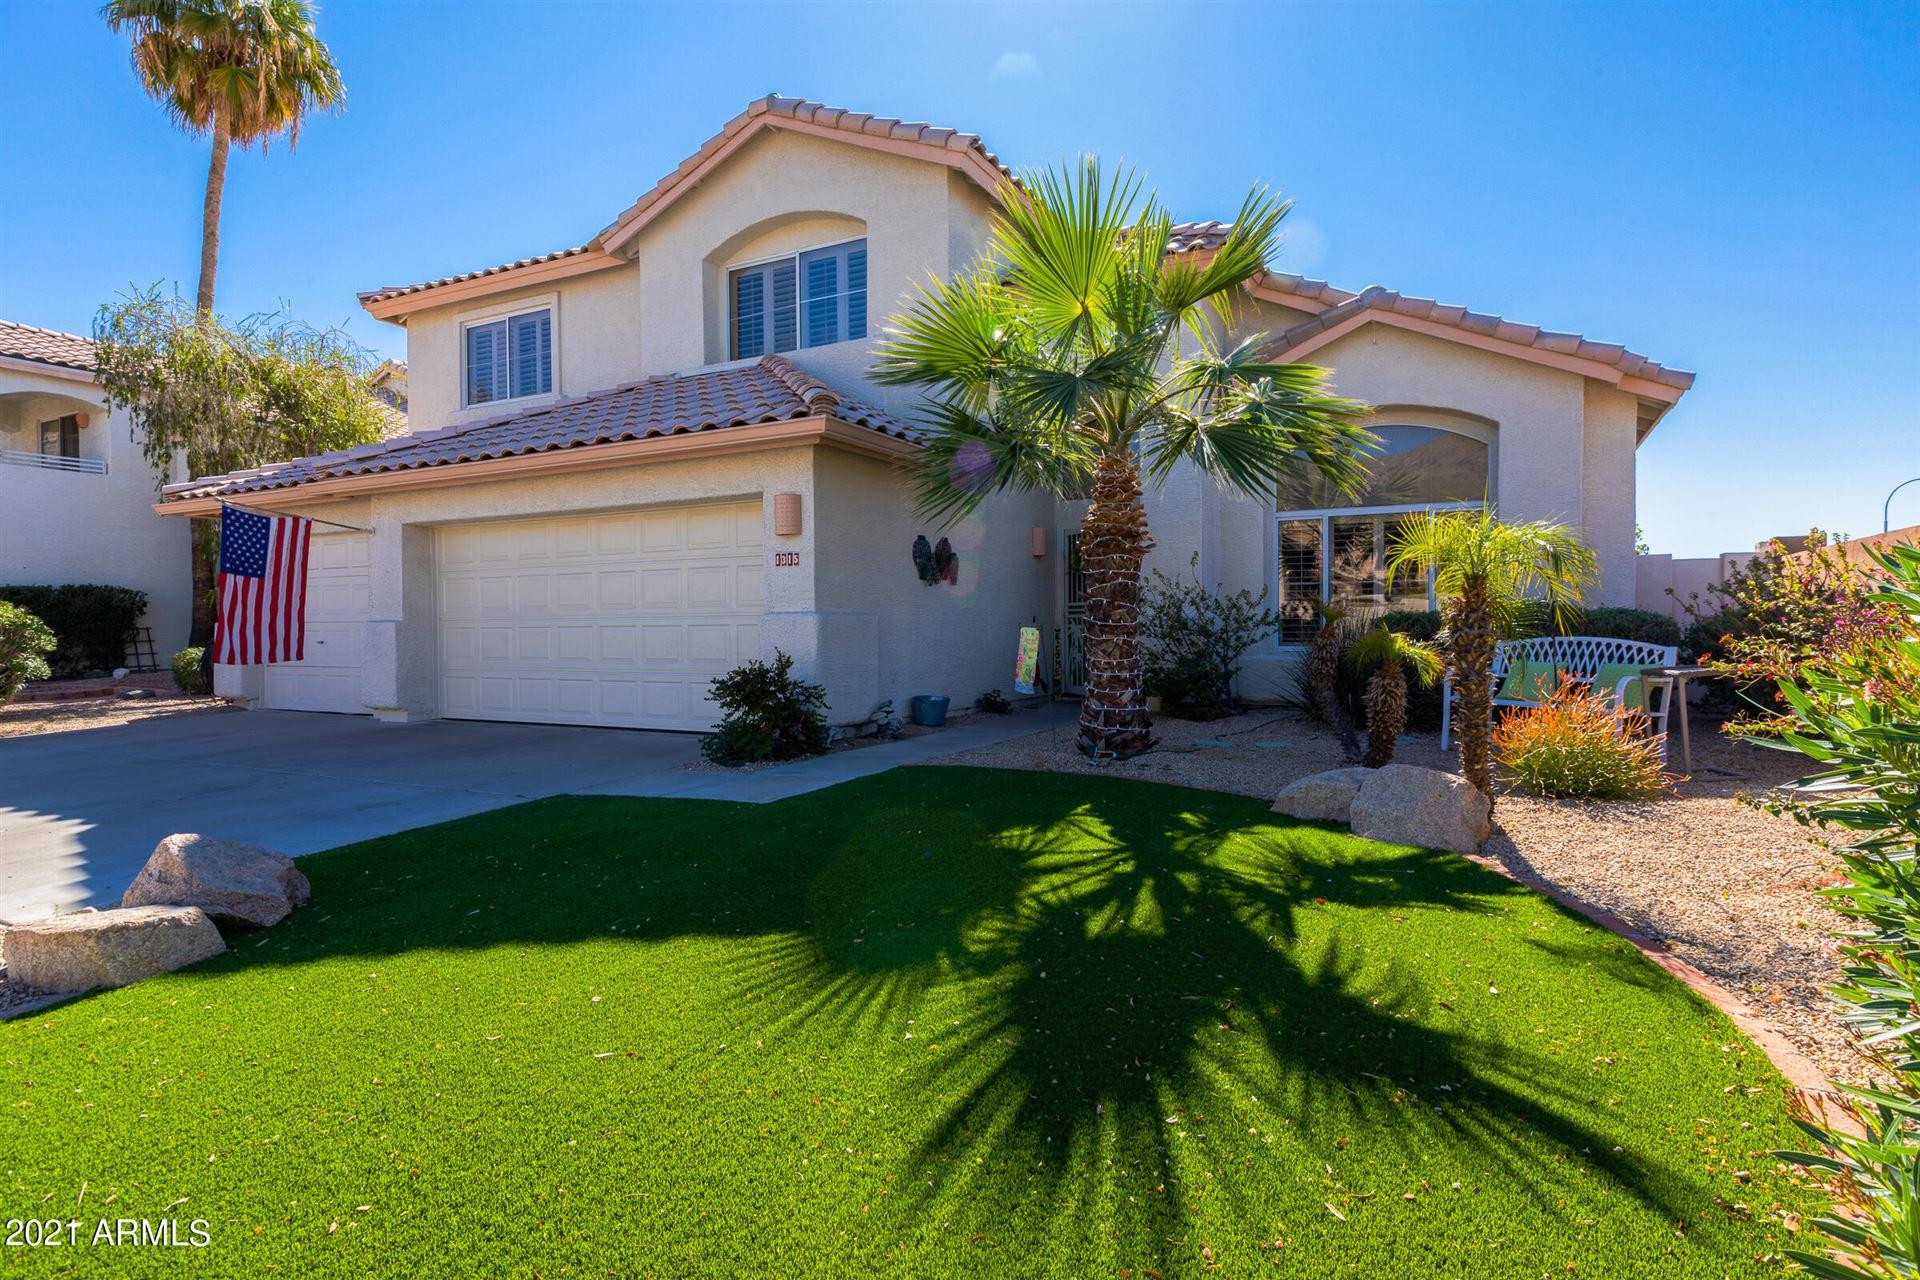 Photo of 1315 E Thistle Landing Drive, Phoenix, AZ 85048 (MLS # 6201991)